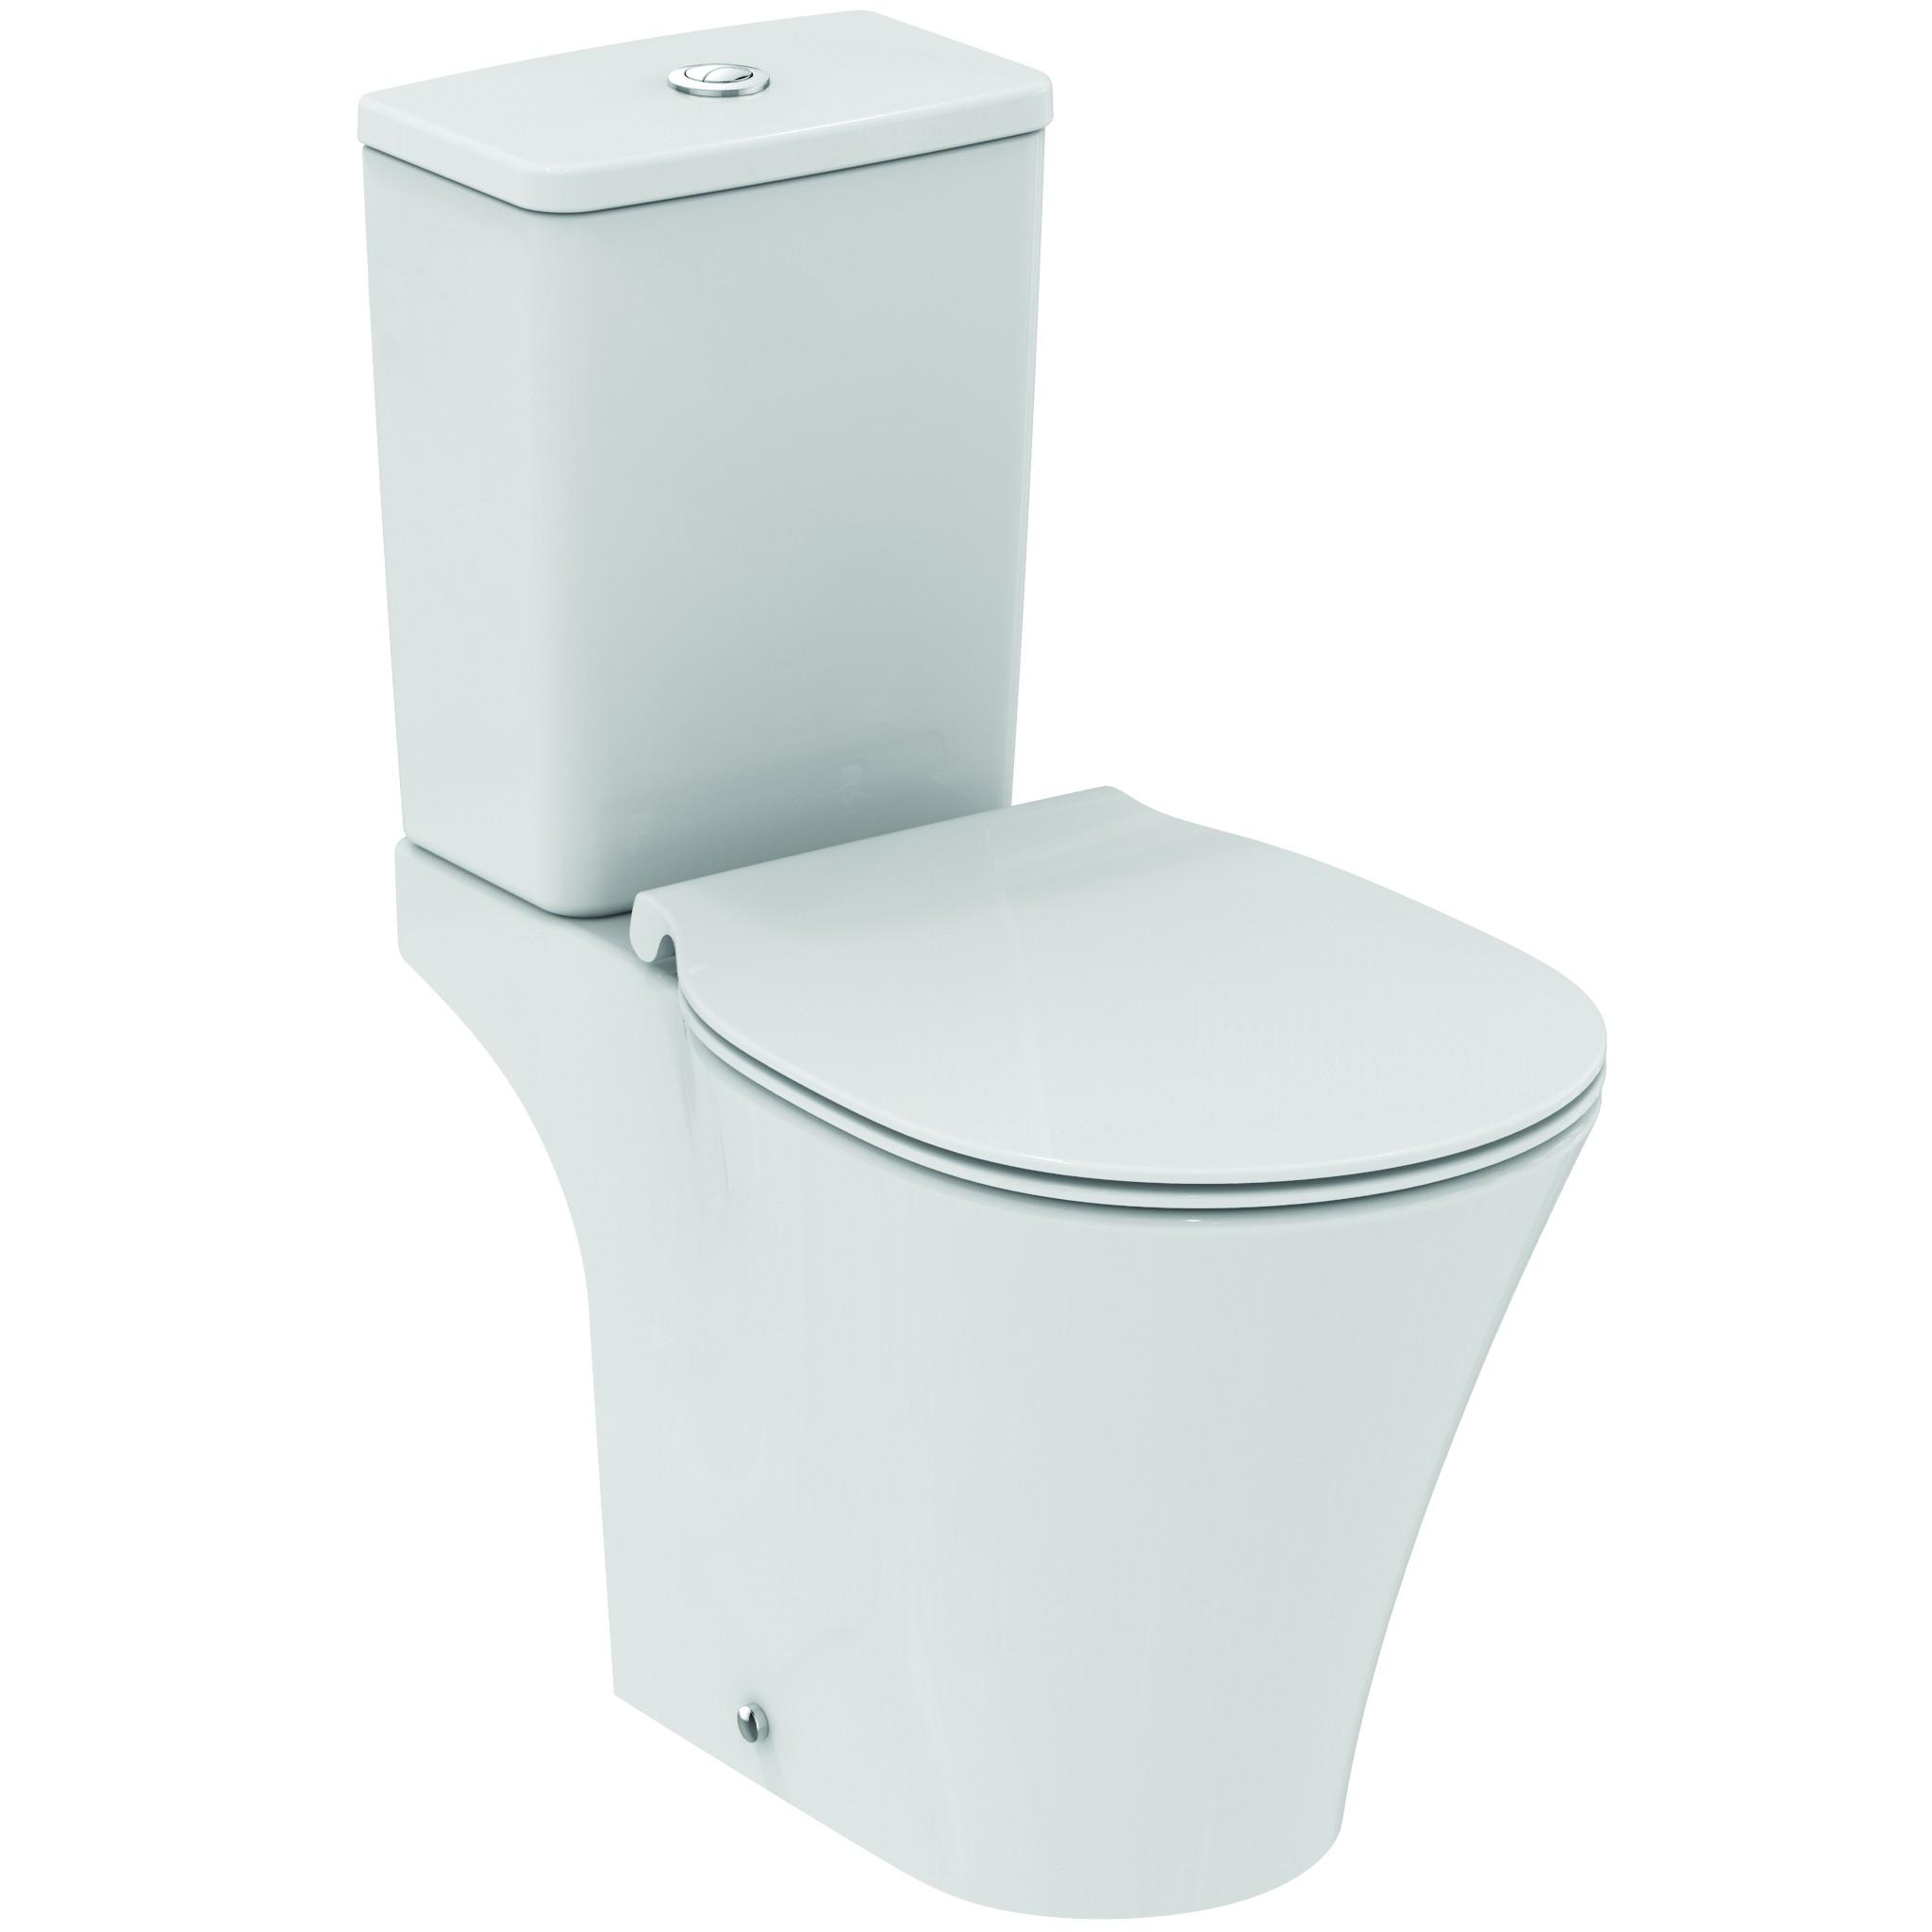 Vas WC Ideal Standard Connect Air AquaBlade